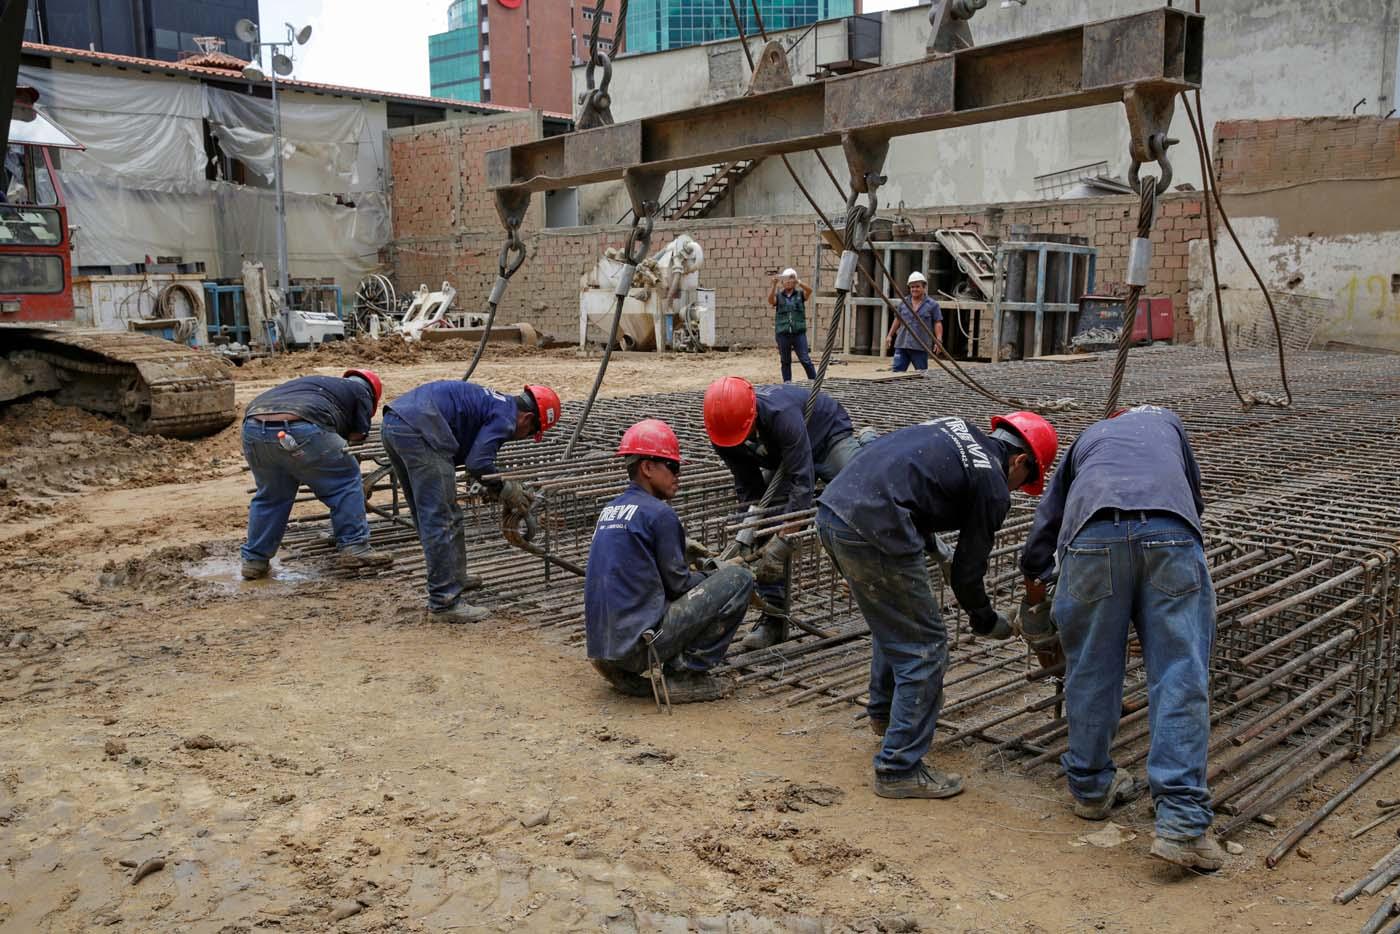 2016-10-07T114955Z_688128936_D1AEUFPCTFAA_RTRMADP_3_VENEZUELA-CONSTRUCTION